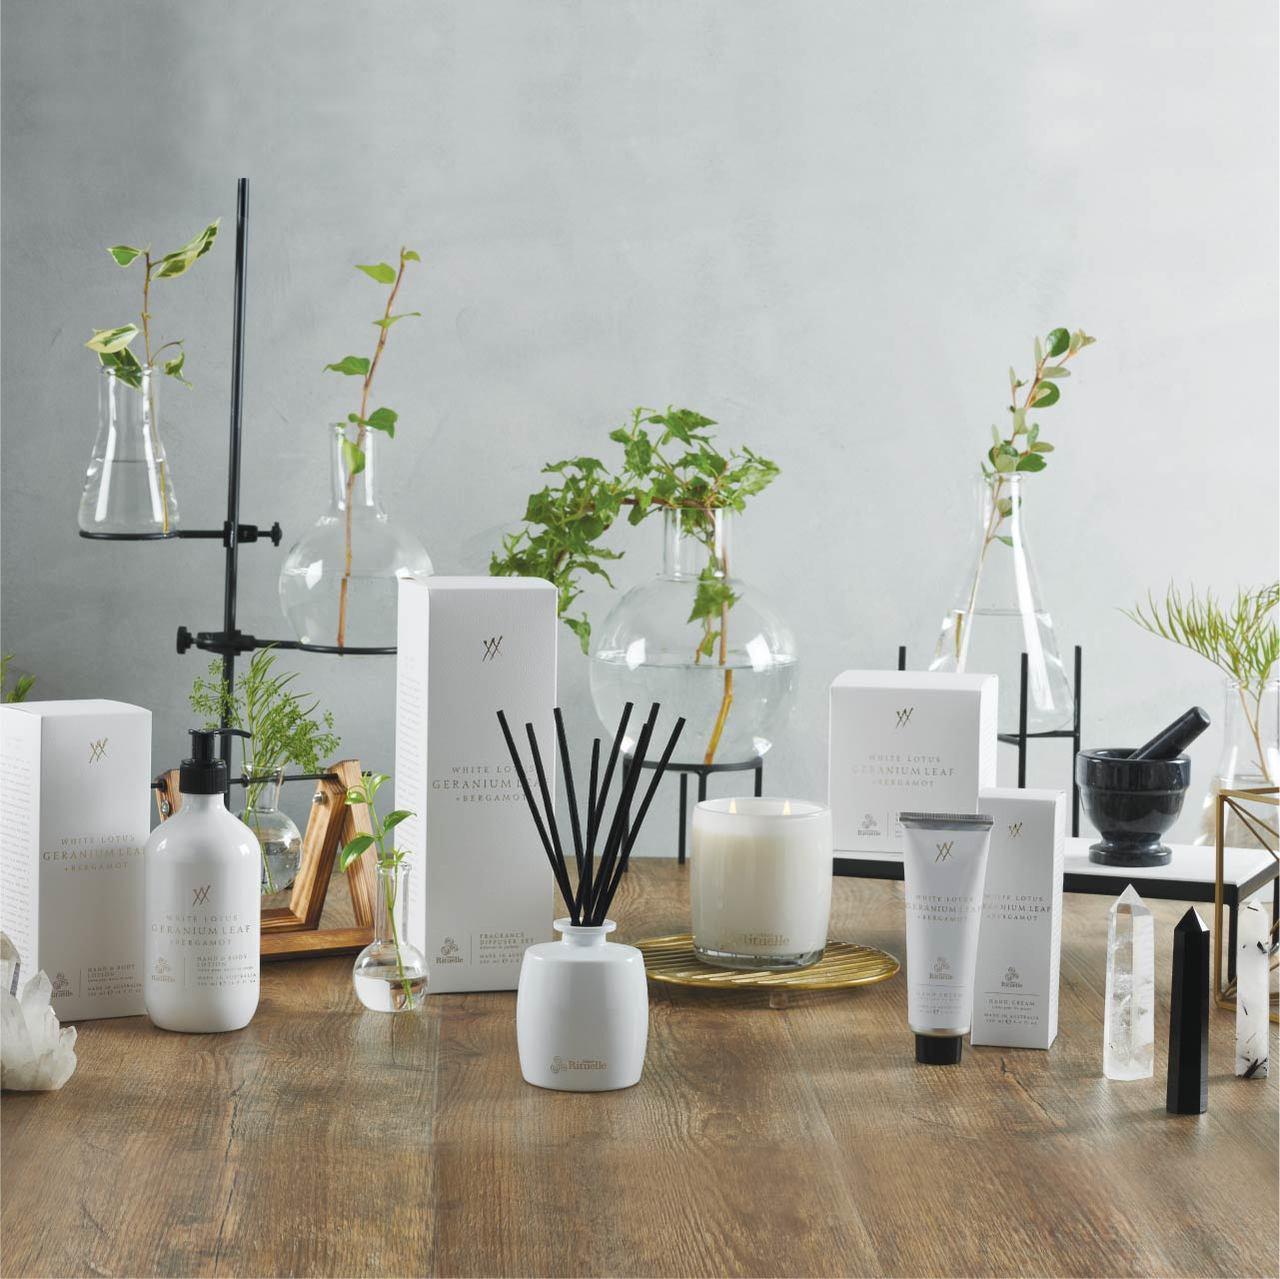 Alchemy - White Lotus, Geranium Leaf & Bergamot - Urban Rituelle